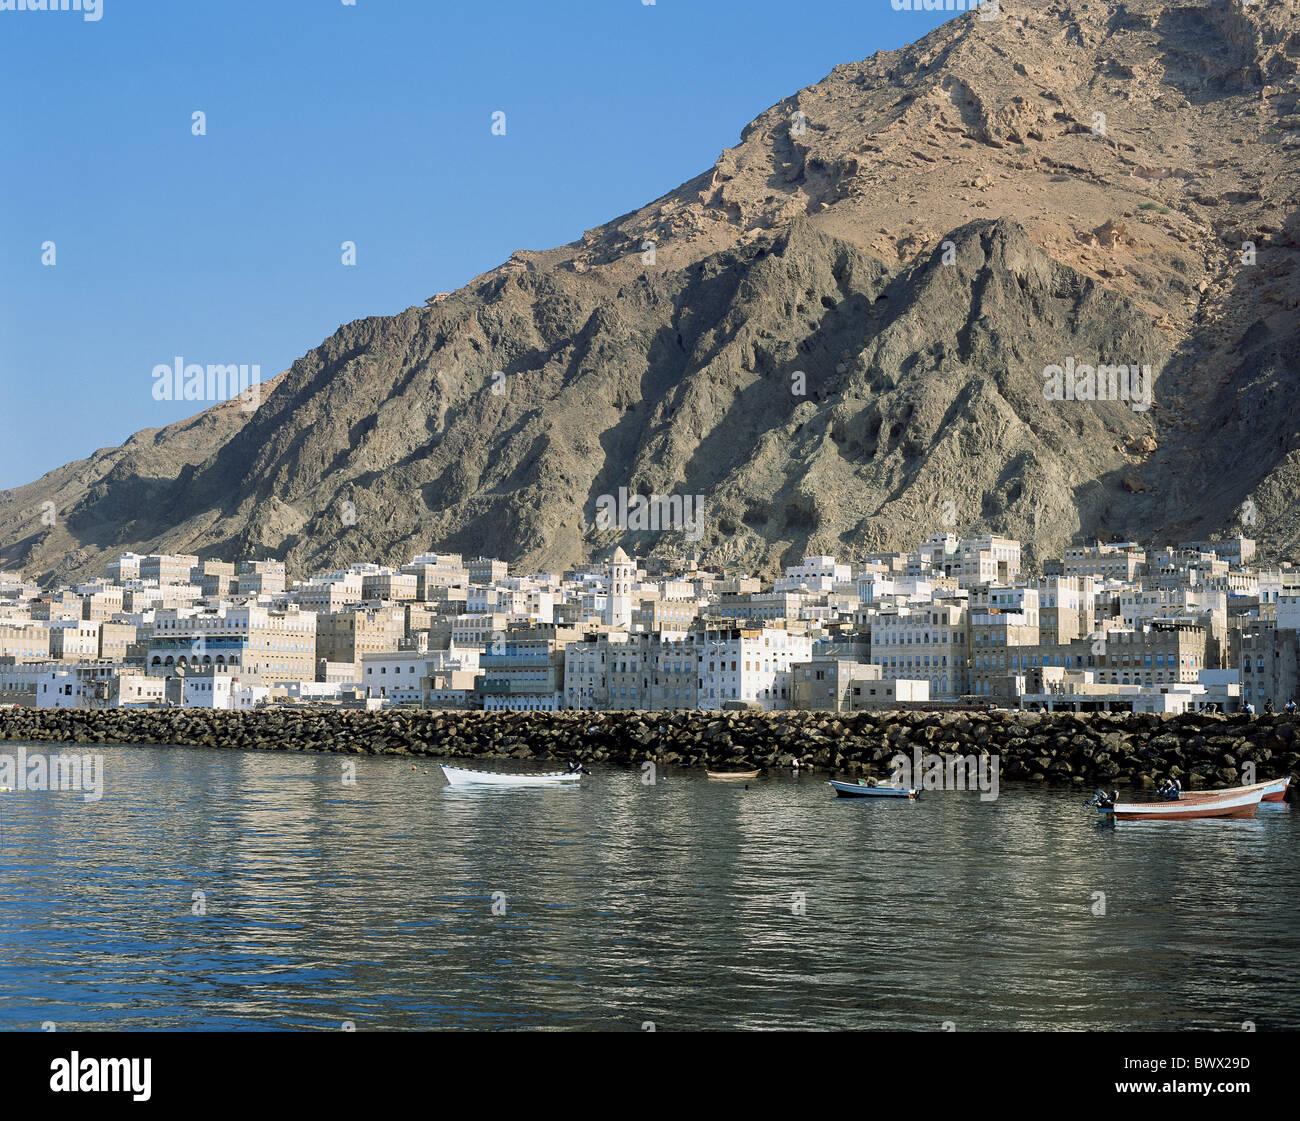 Al Mukalla rock cliff hinterland Indian ocean Yemen Middle East - Stock Image